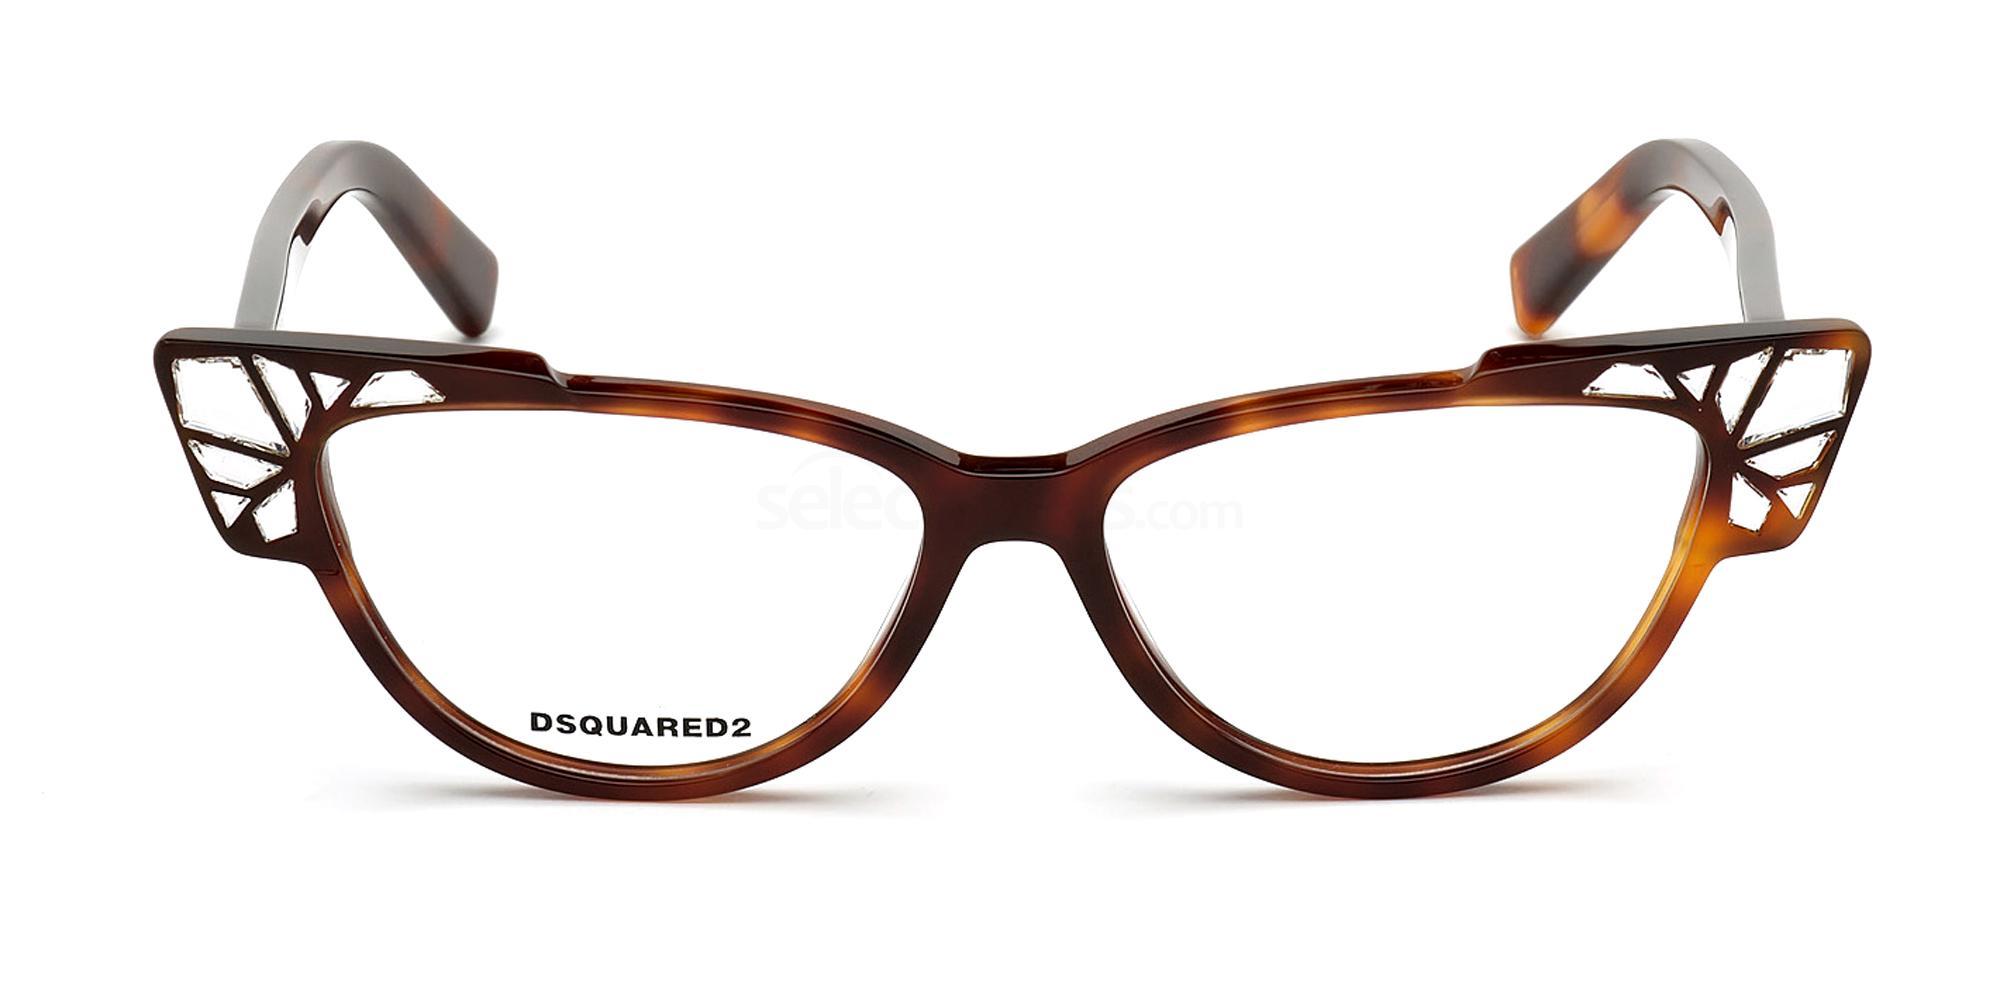 052 DQ5310 Glasses, DSQUARED2